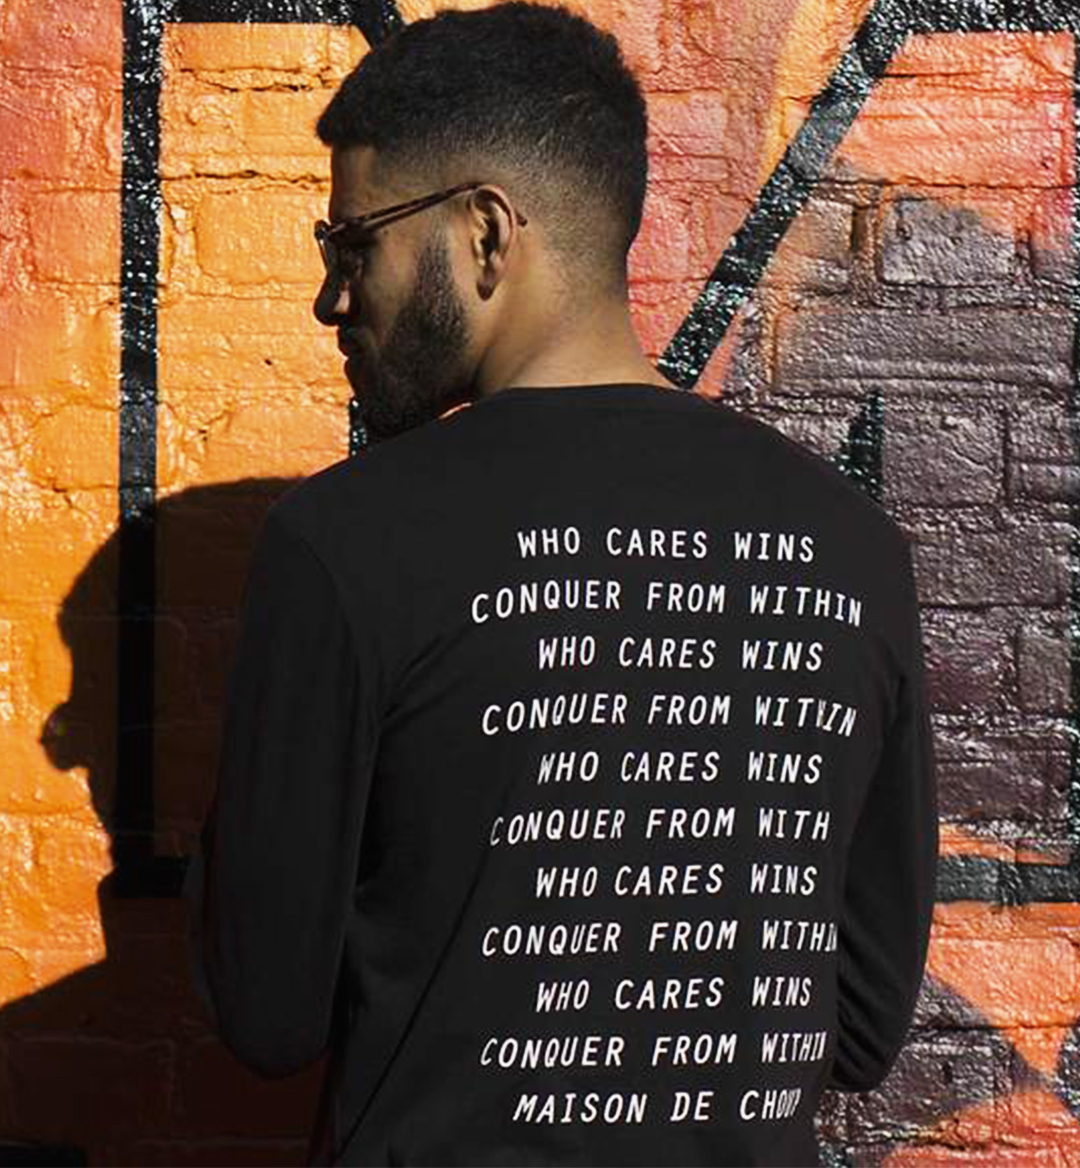 streetwear brands mental health mobile